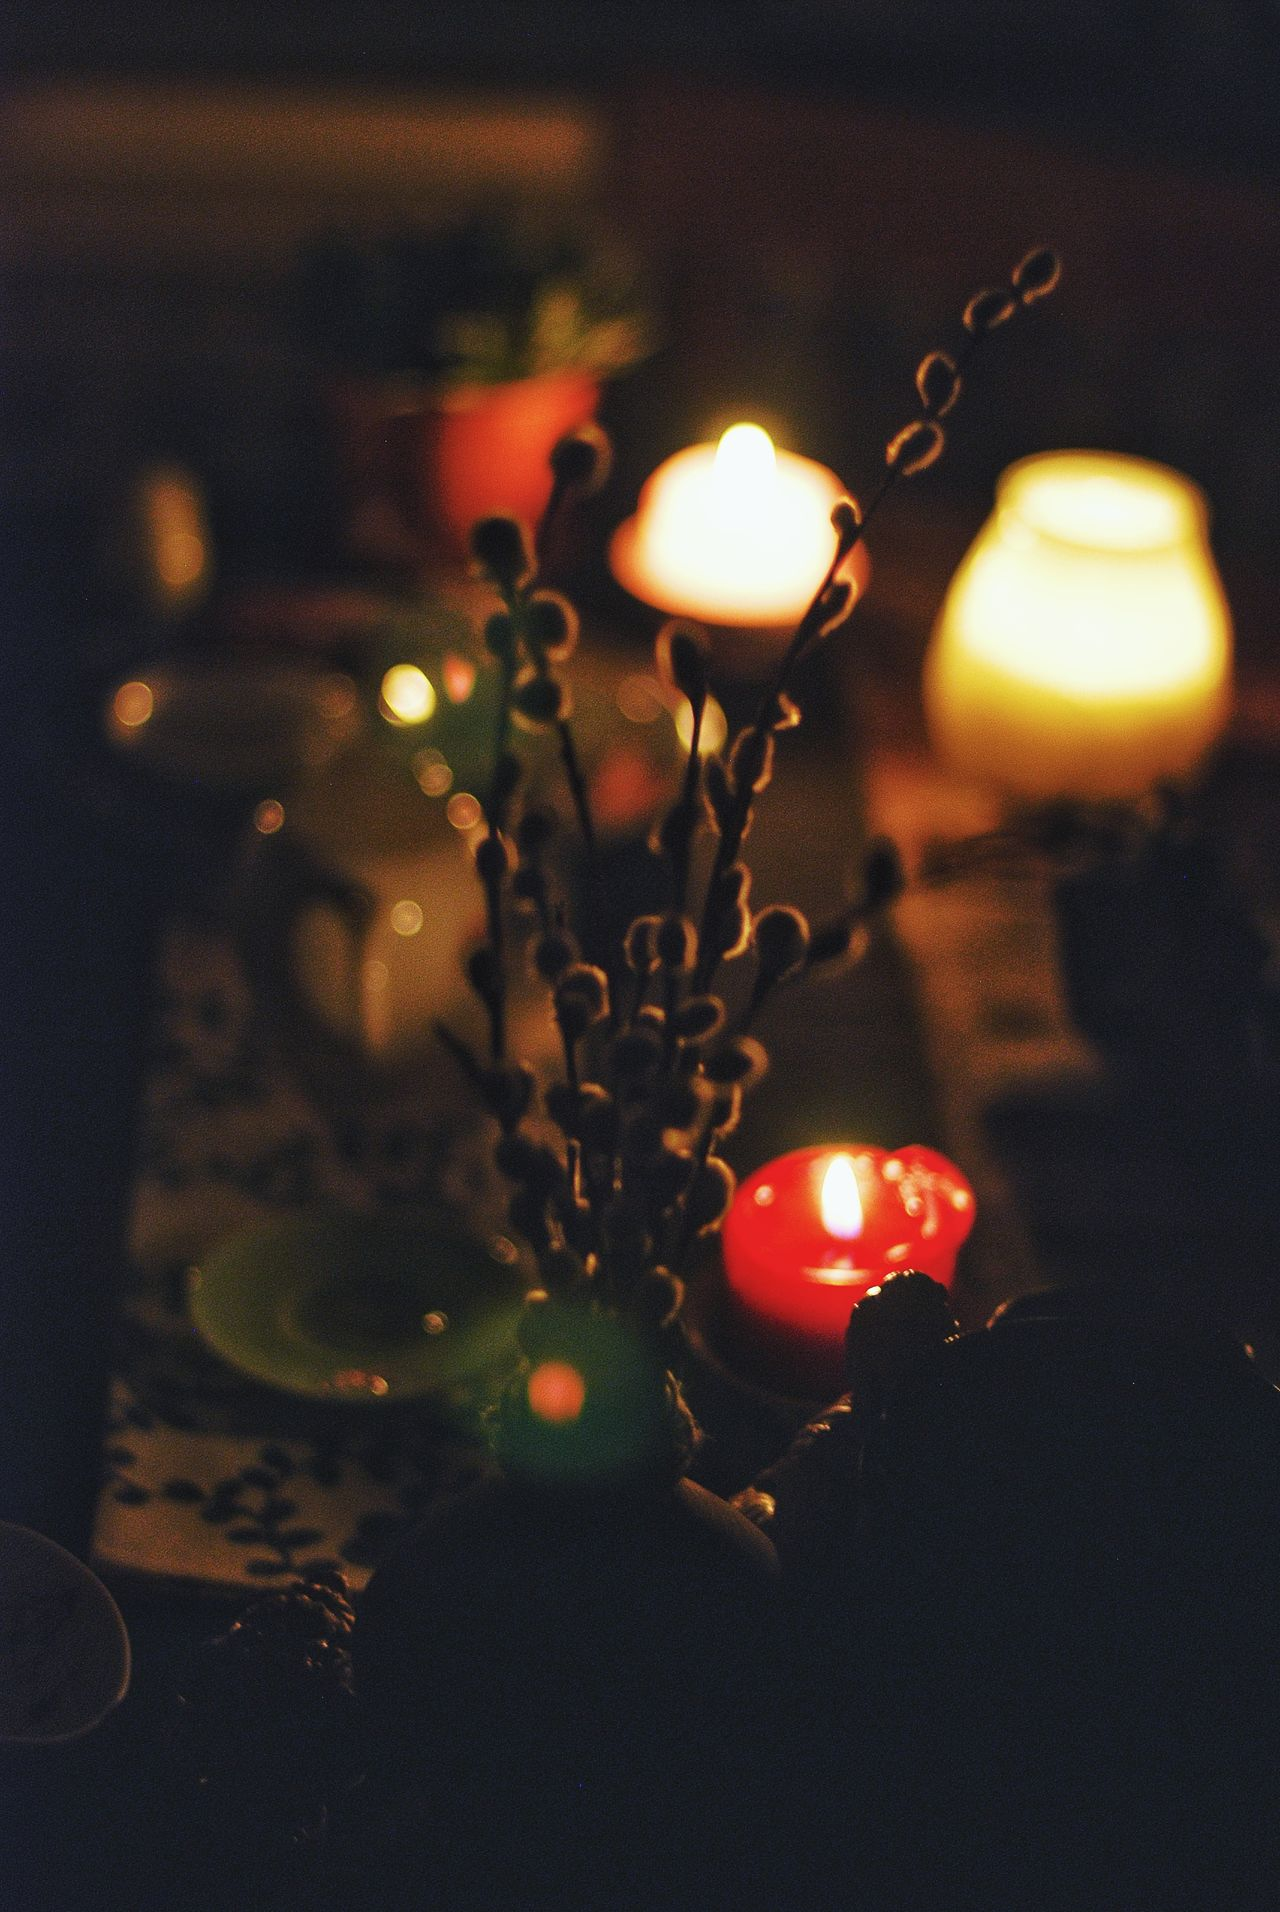 Illuminated Lighting Equipment Close-up Indoors  Night No People Чай Tea Cup Teapot Tea - Hot Drink чайнаяцеремония Samara Самара Welcome To Black EyeEmNewHere